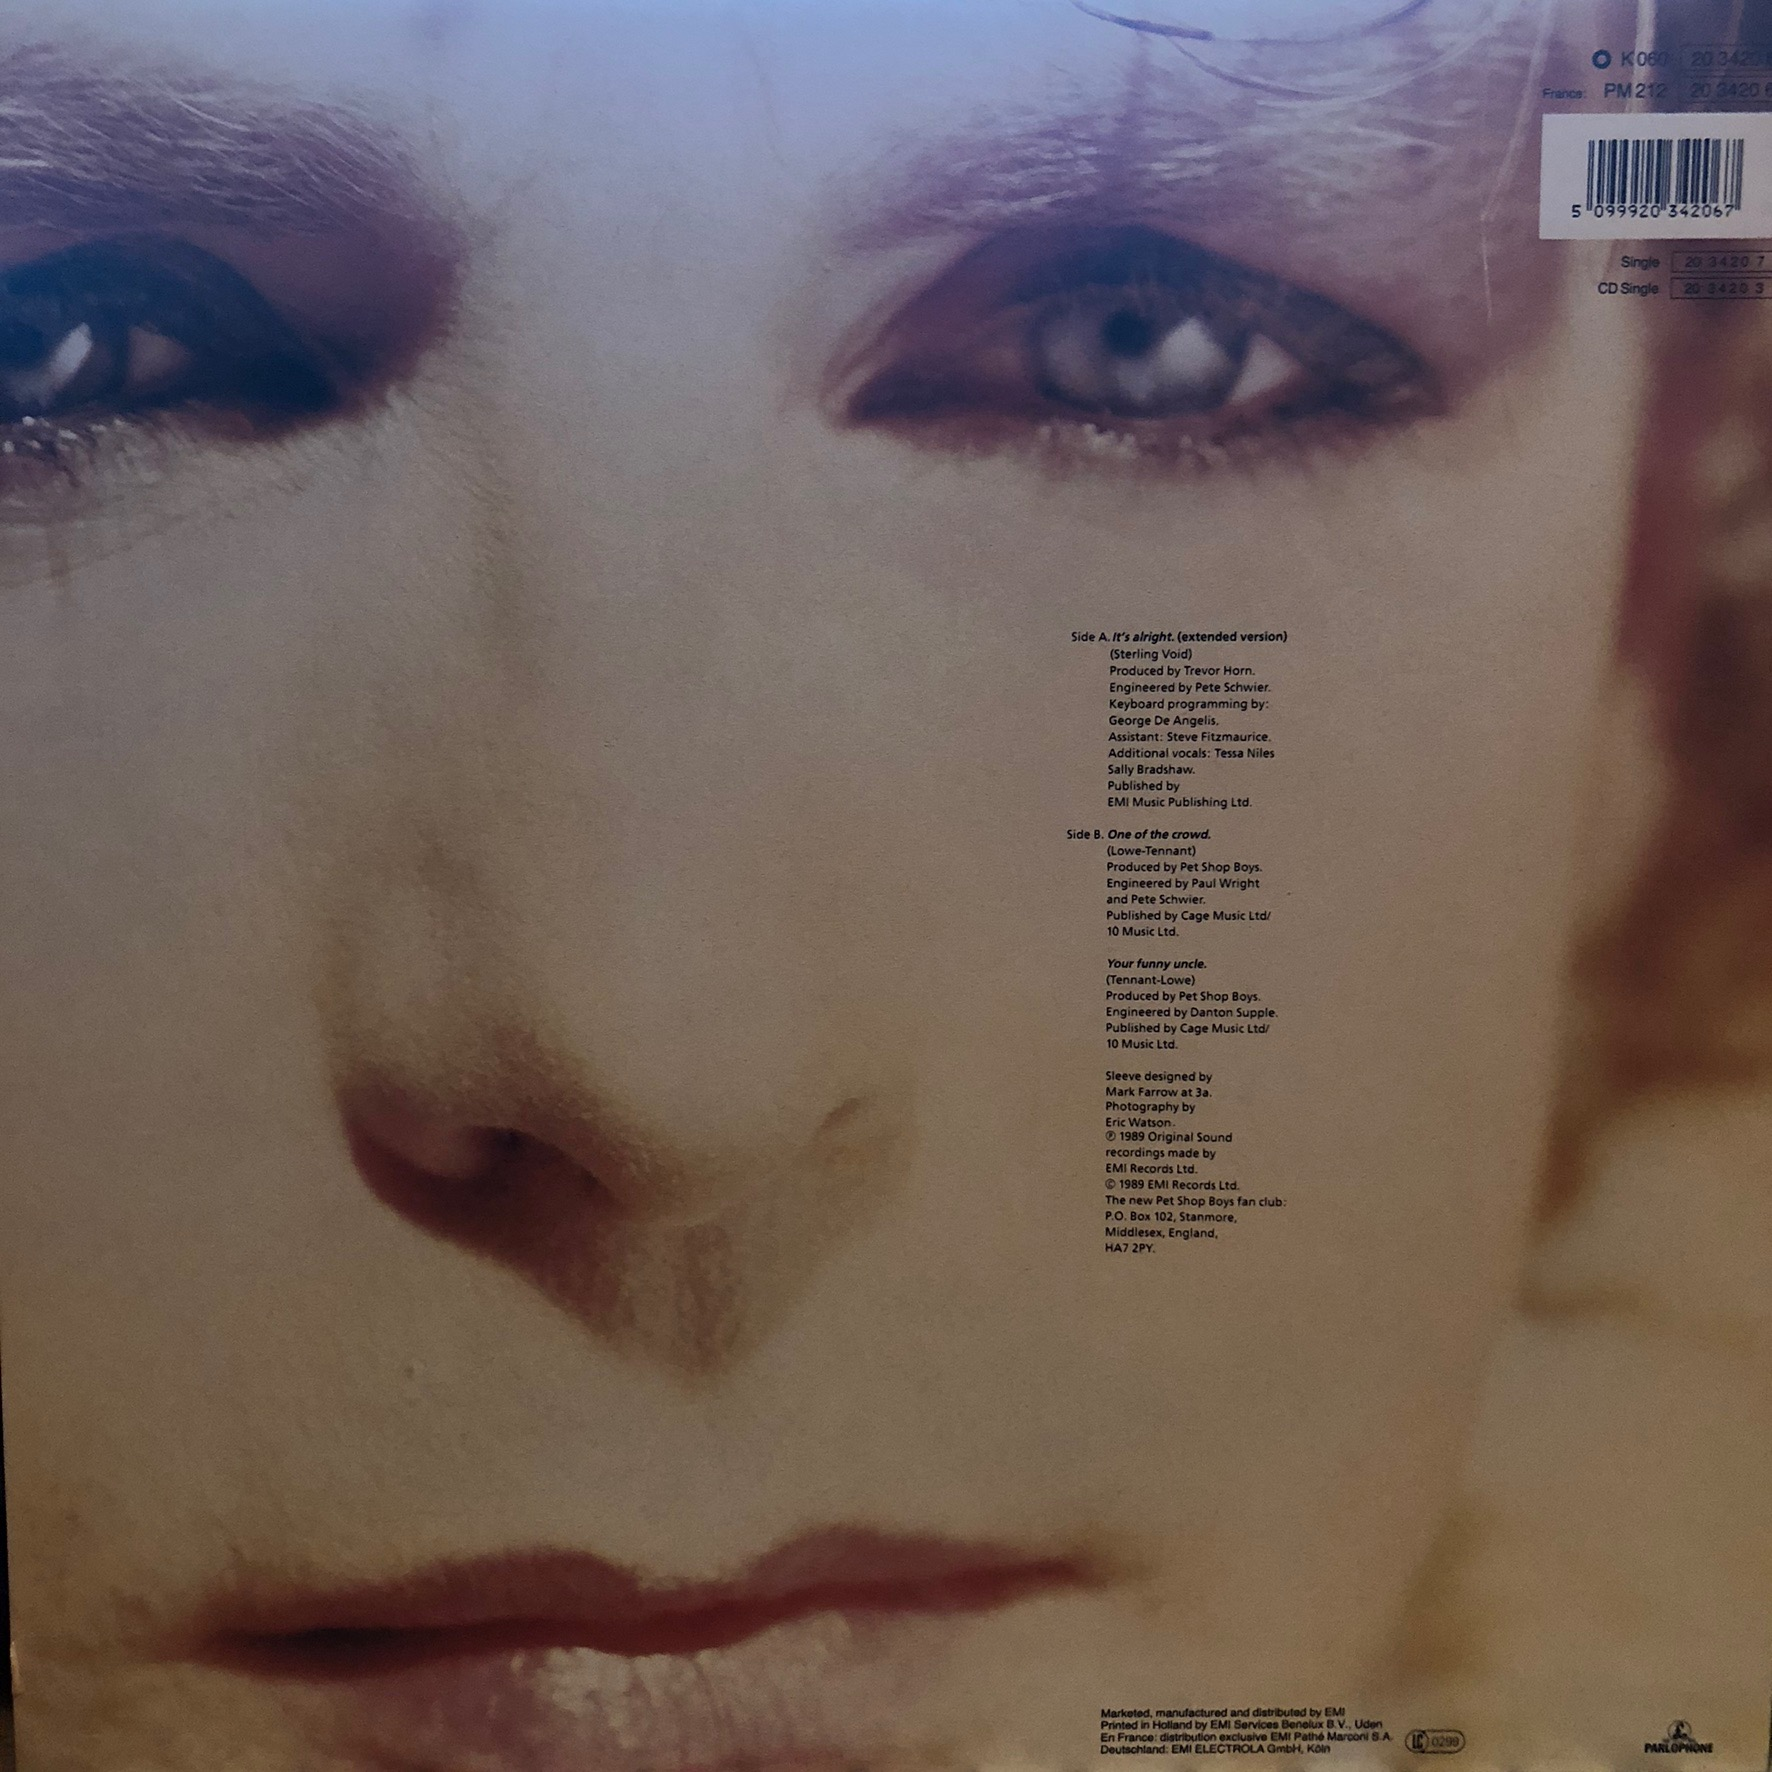 Pet Shop Boys - It's alright - Back Cover